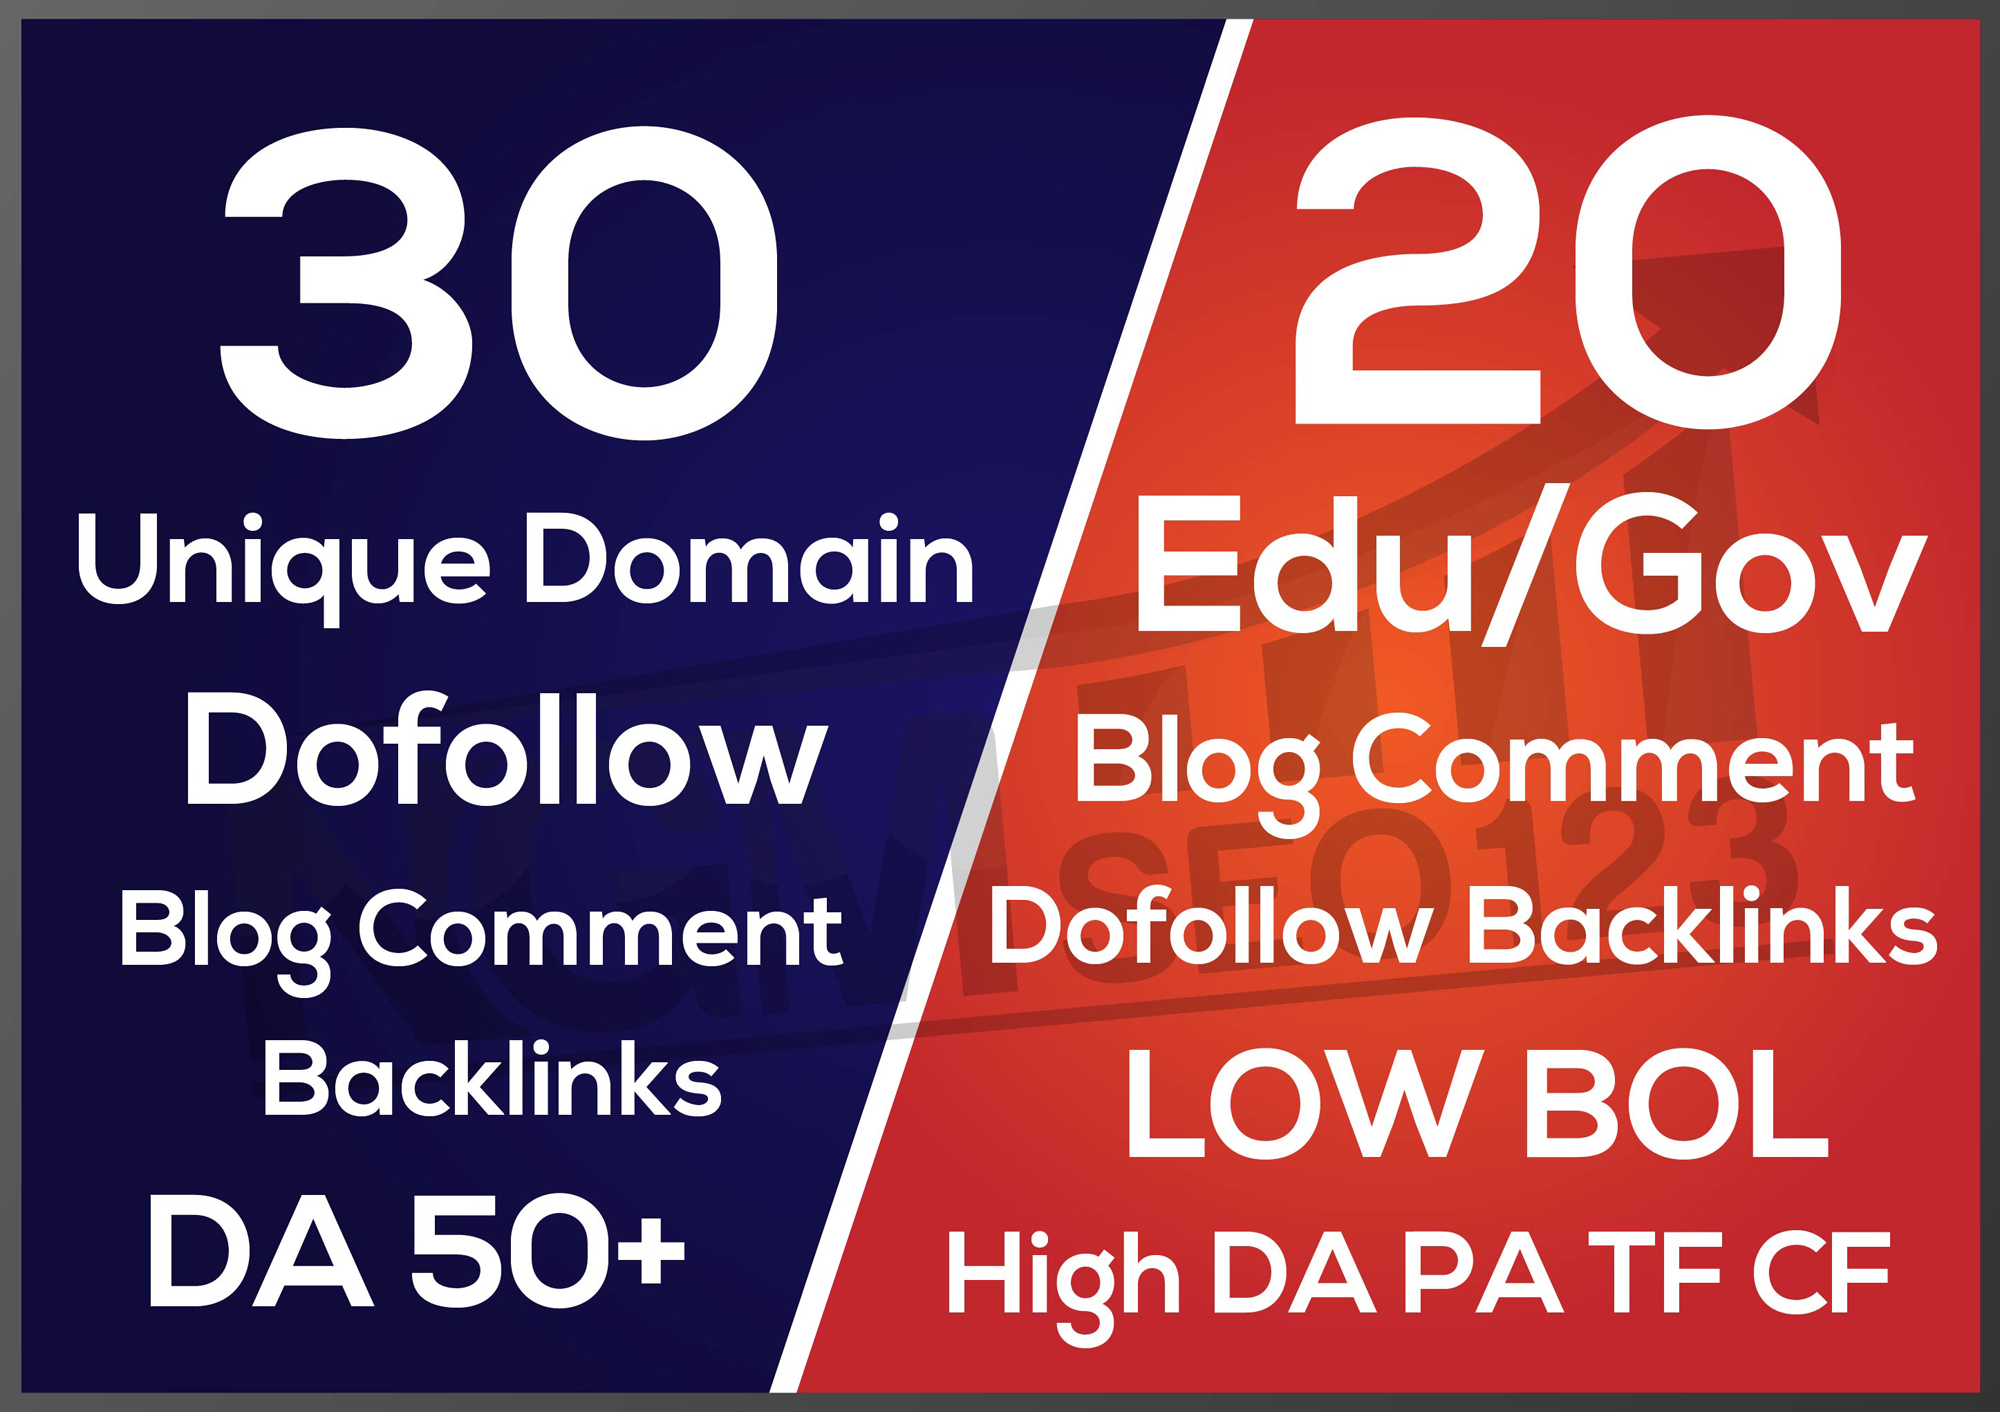 I will build 30 unique domain DA 50 backlinks 20 edu gov blog comment